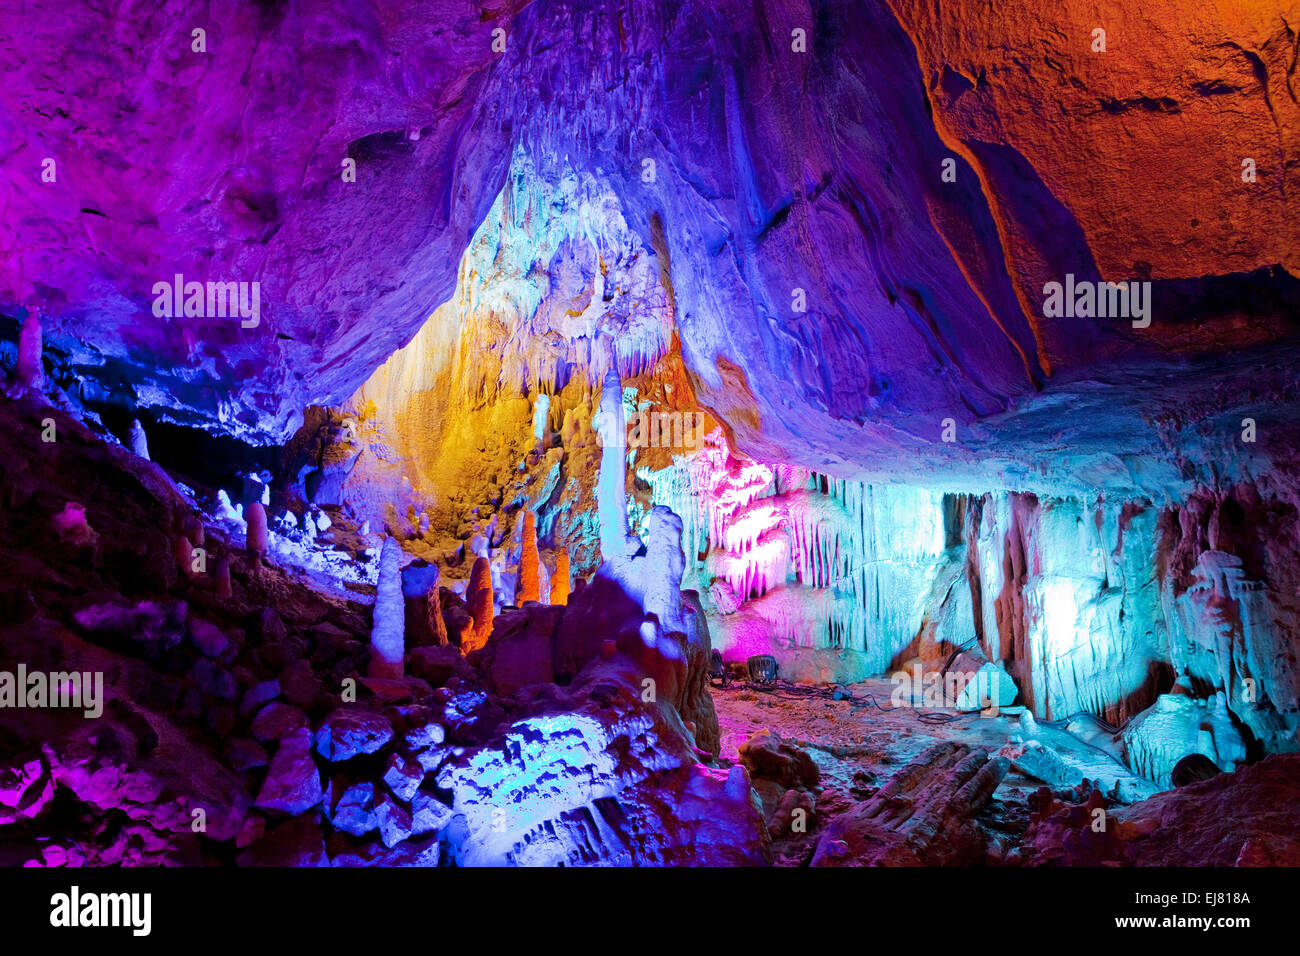 Event cave lights, Iserlohn, Germany - Stock Image